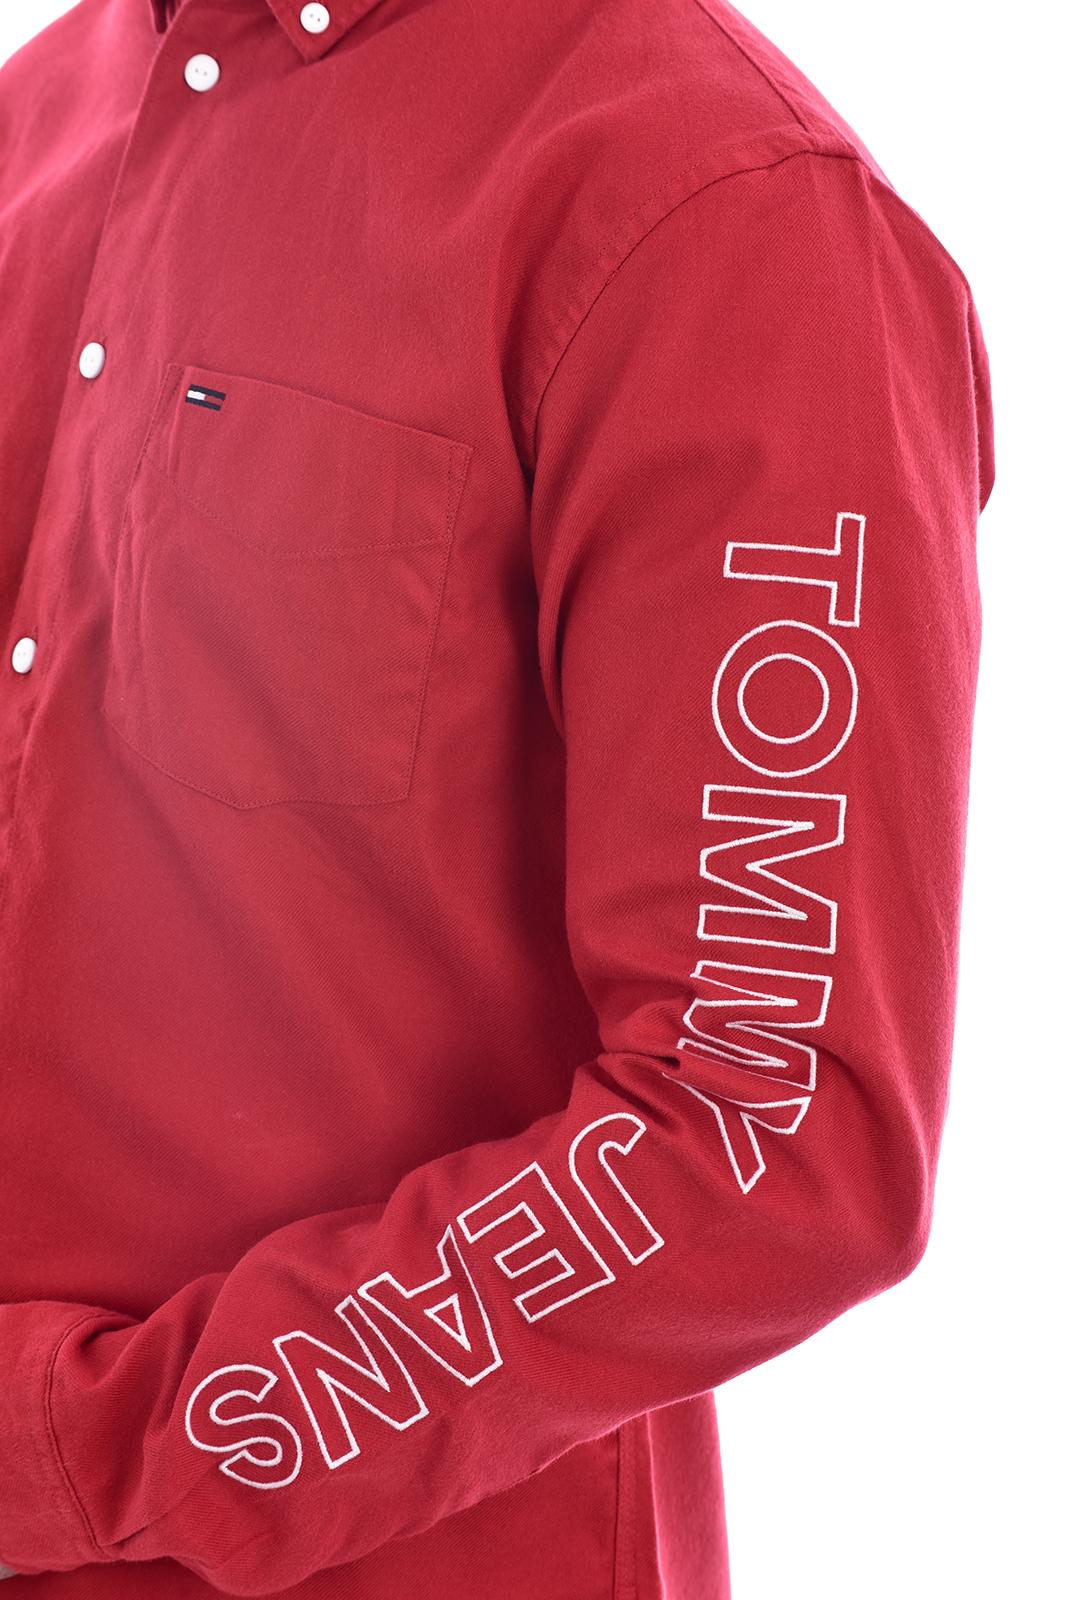 Chemises manches longues  Tommy Jeans DM0DM04997602 602 SAMBA / MULTI